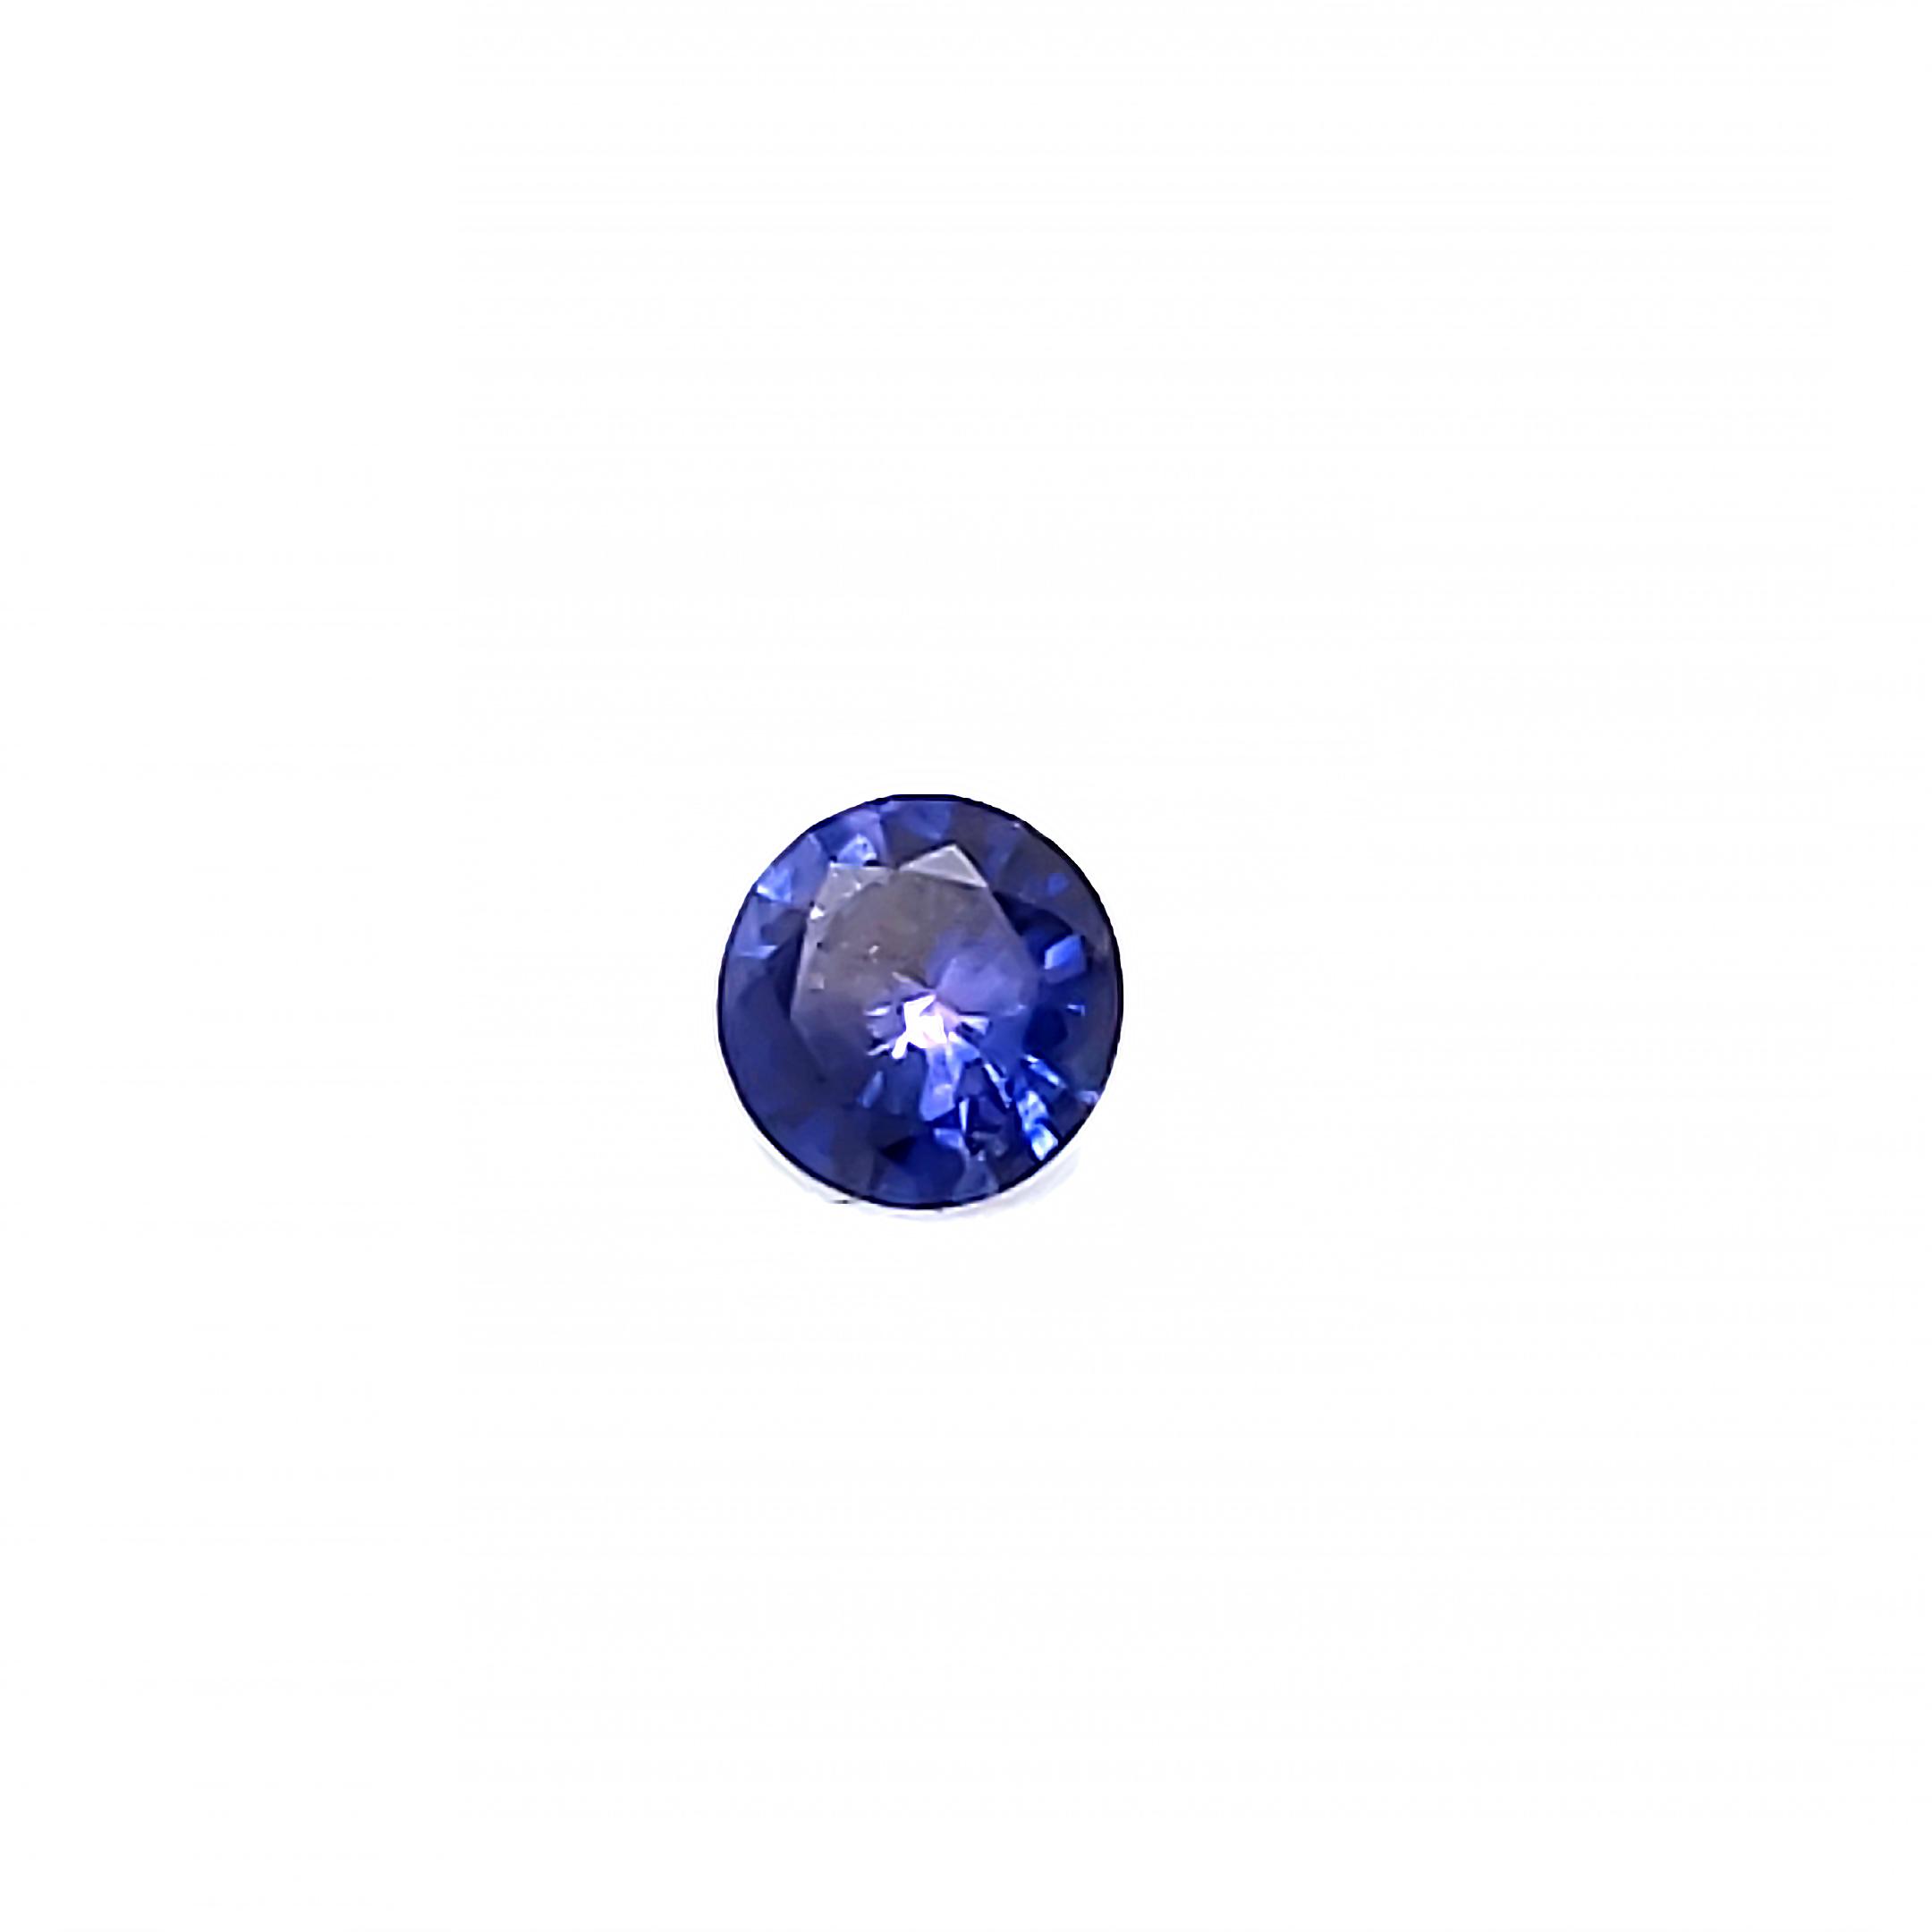 .25 ct. Purplish Blue Sapphire